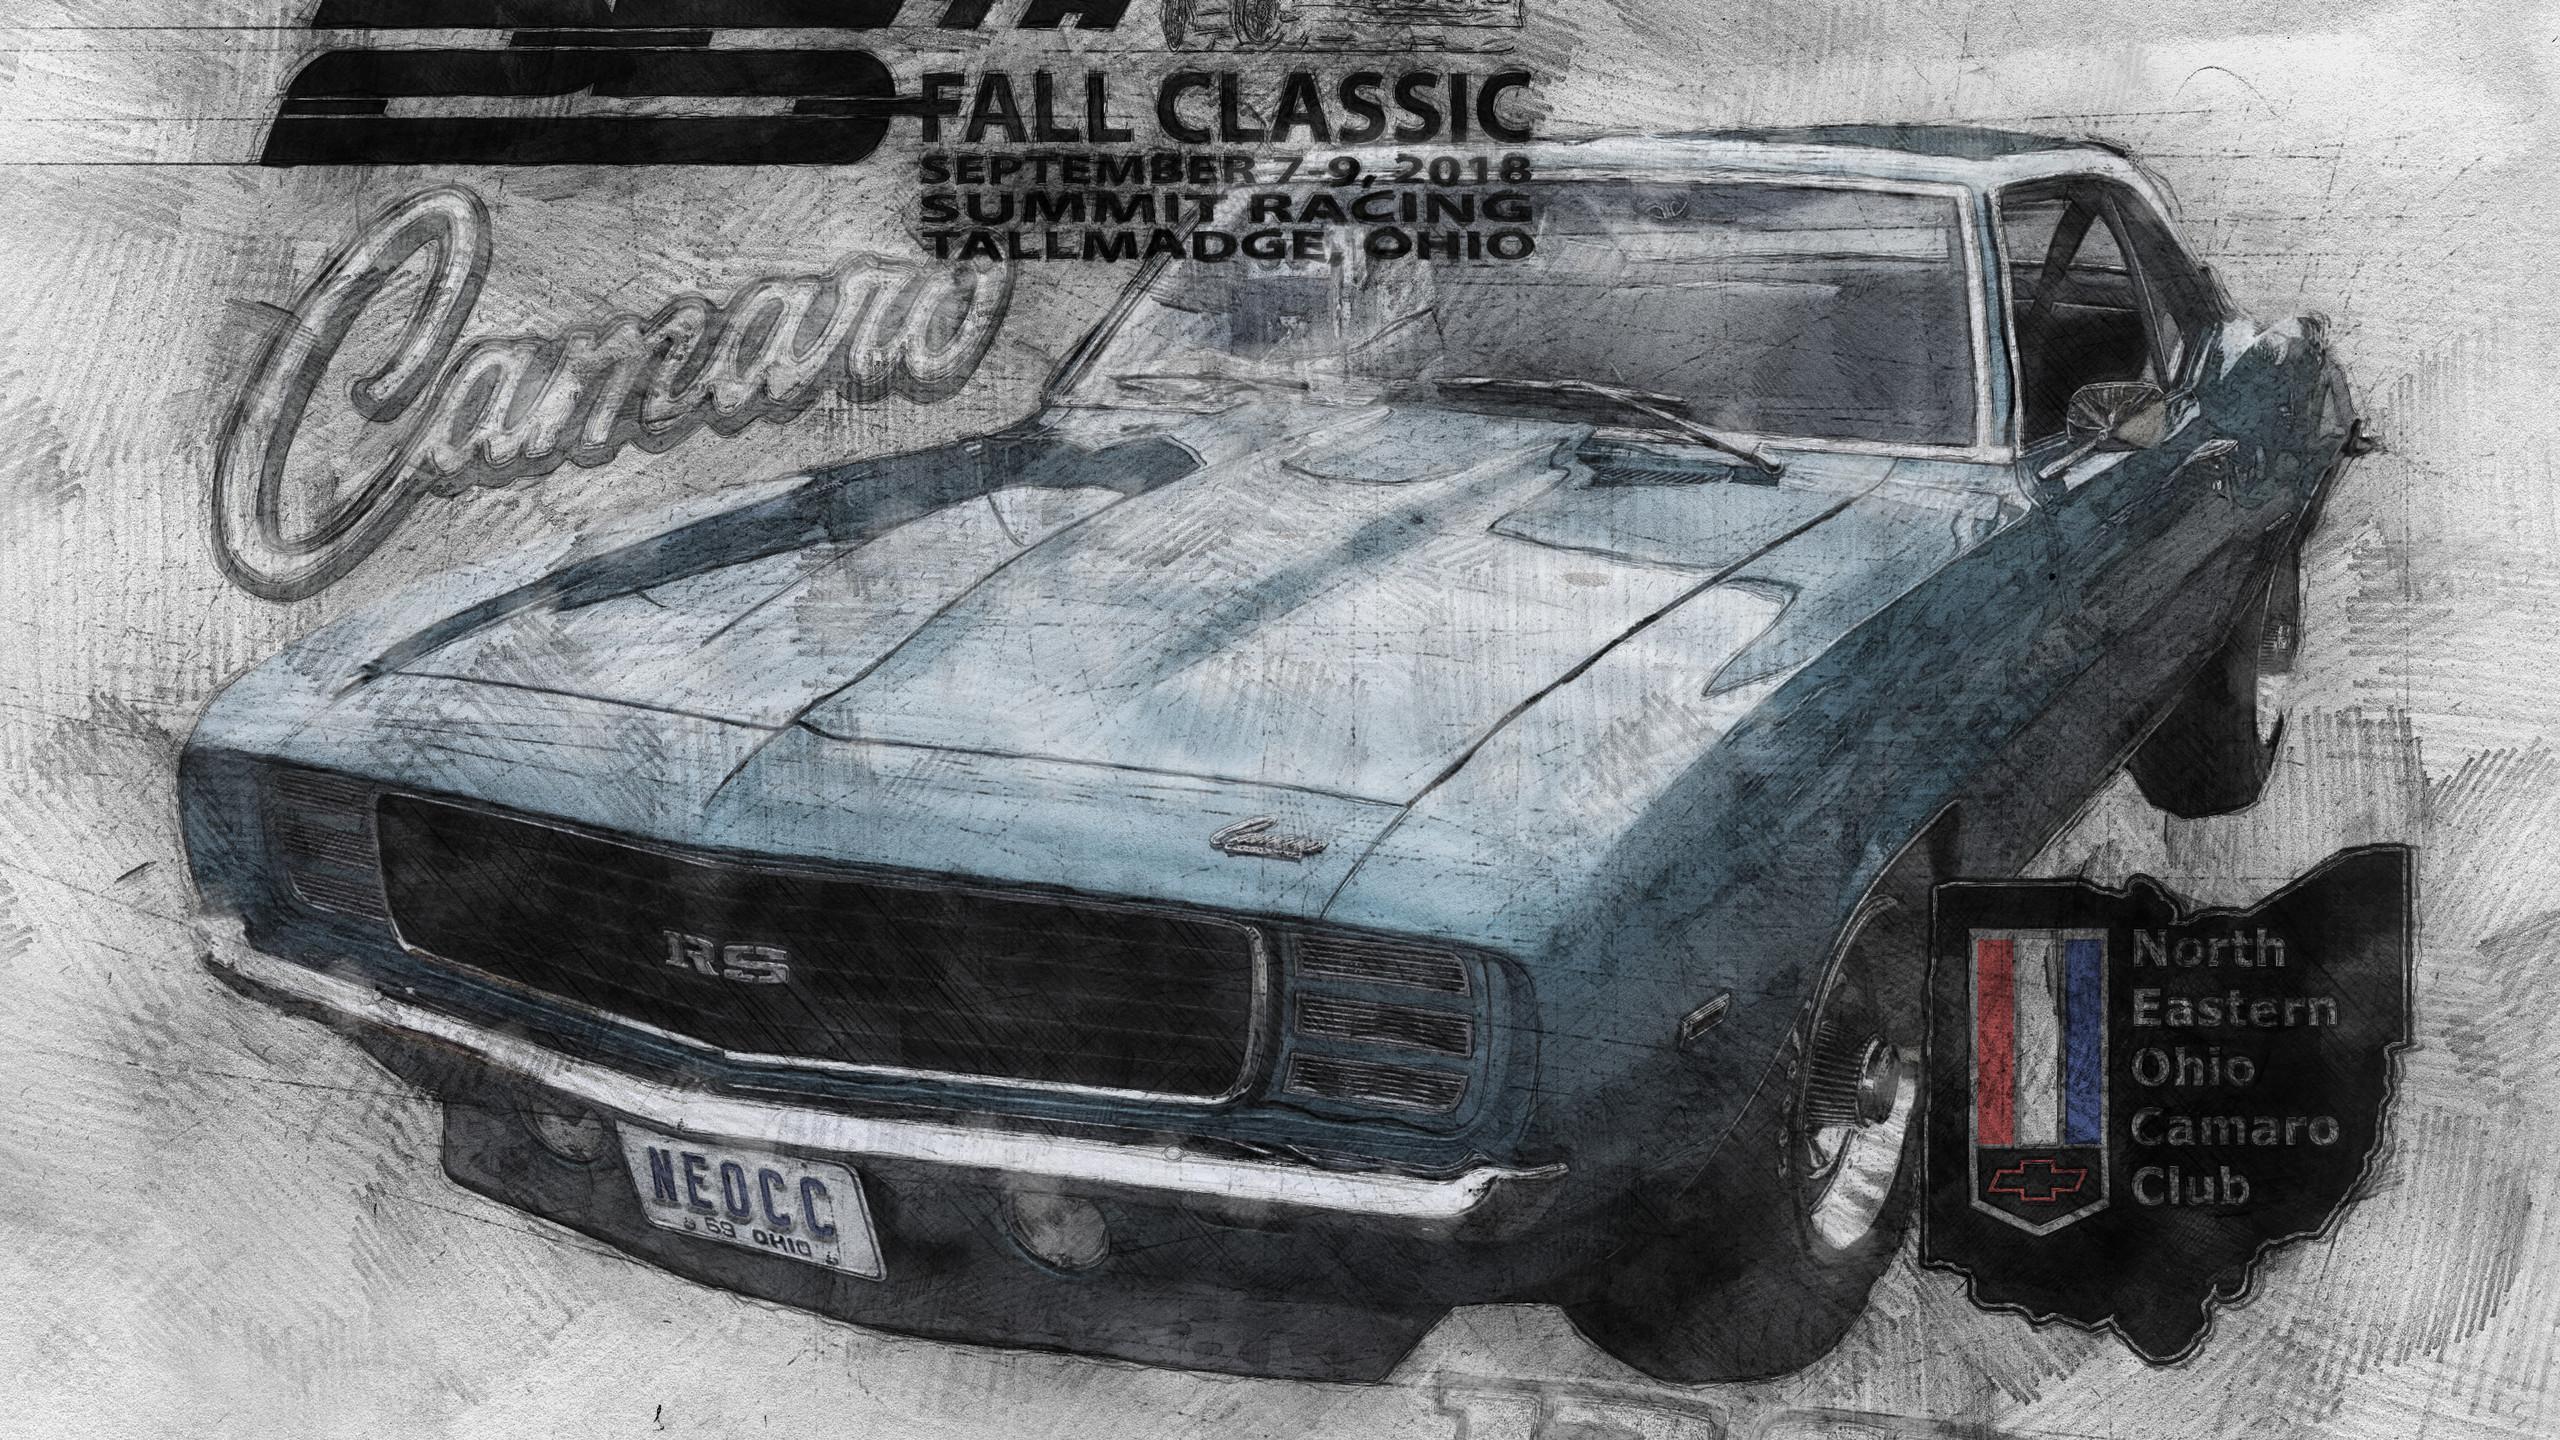 25th NEOCC Fall Classic